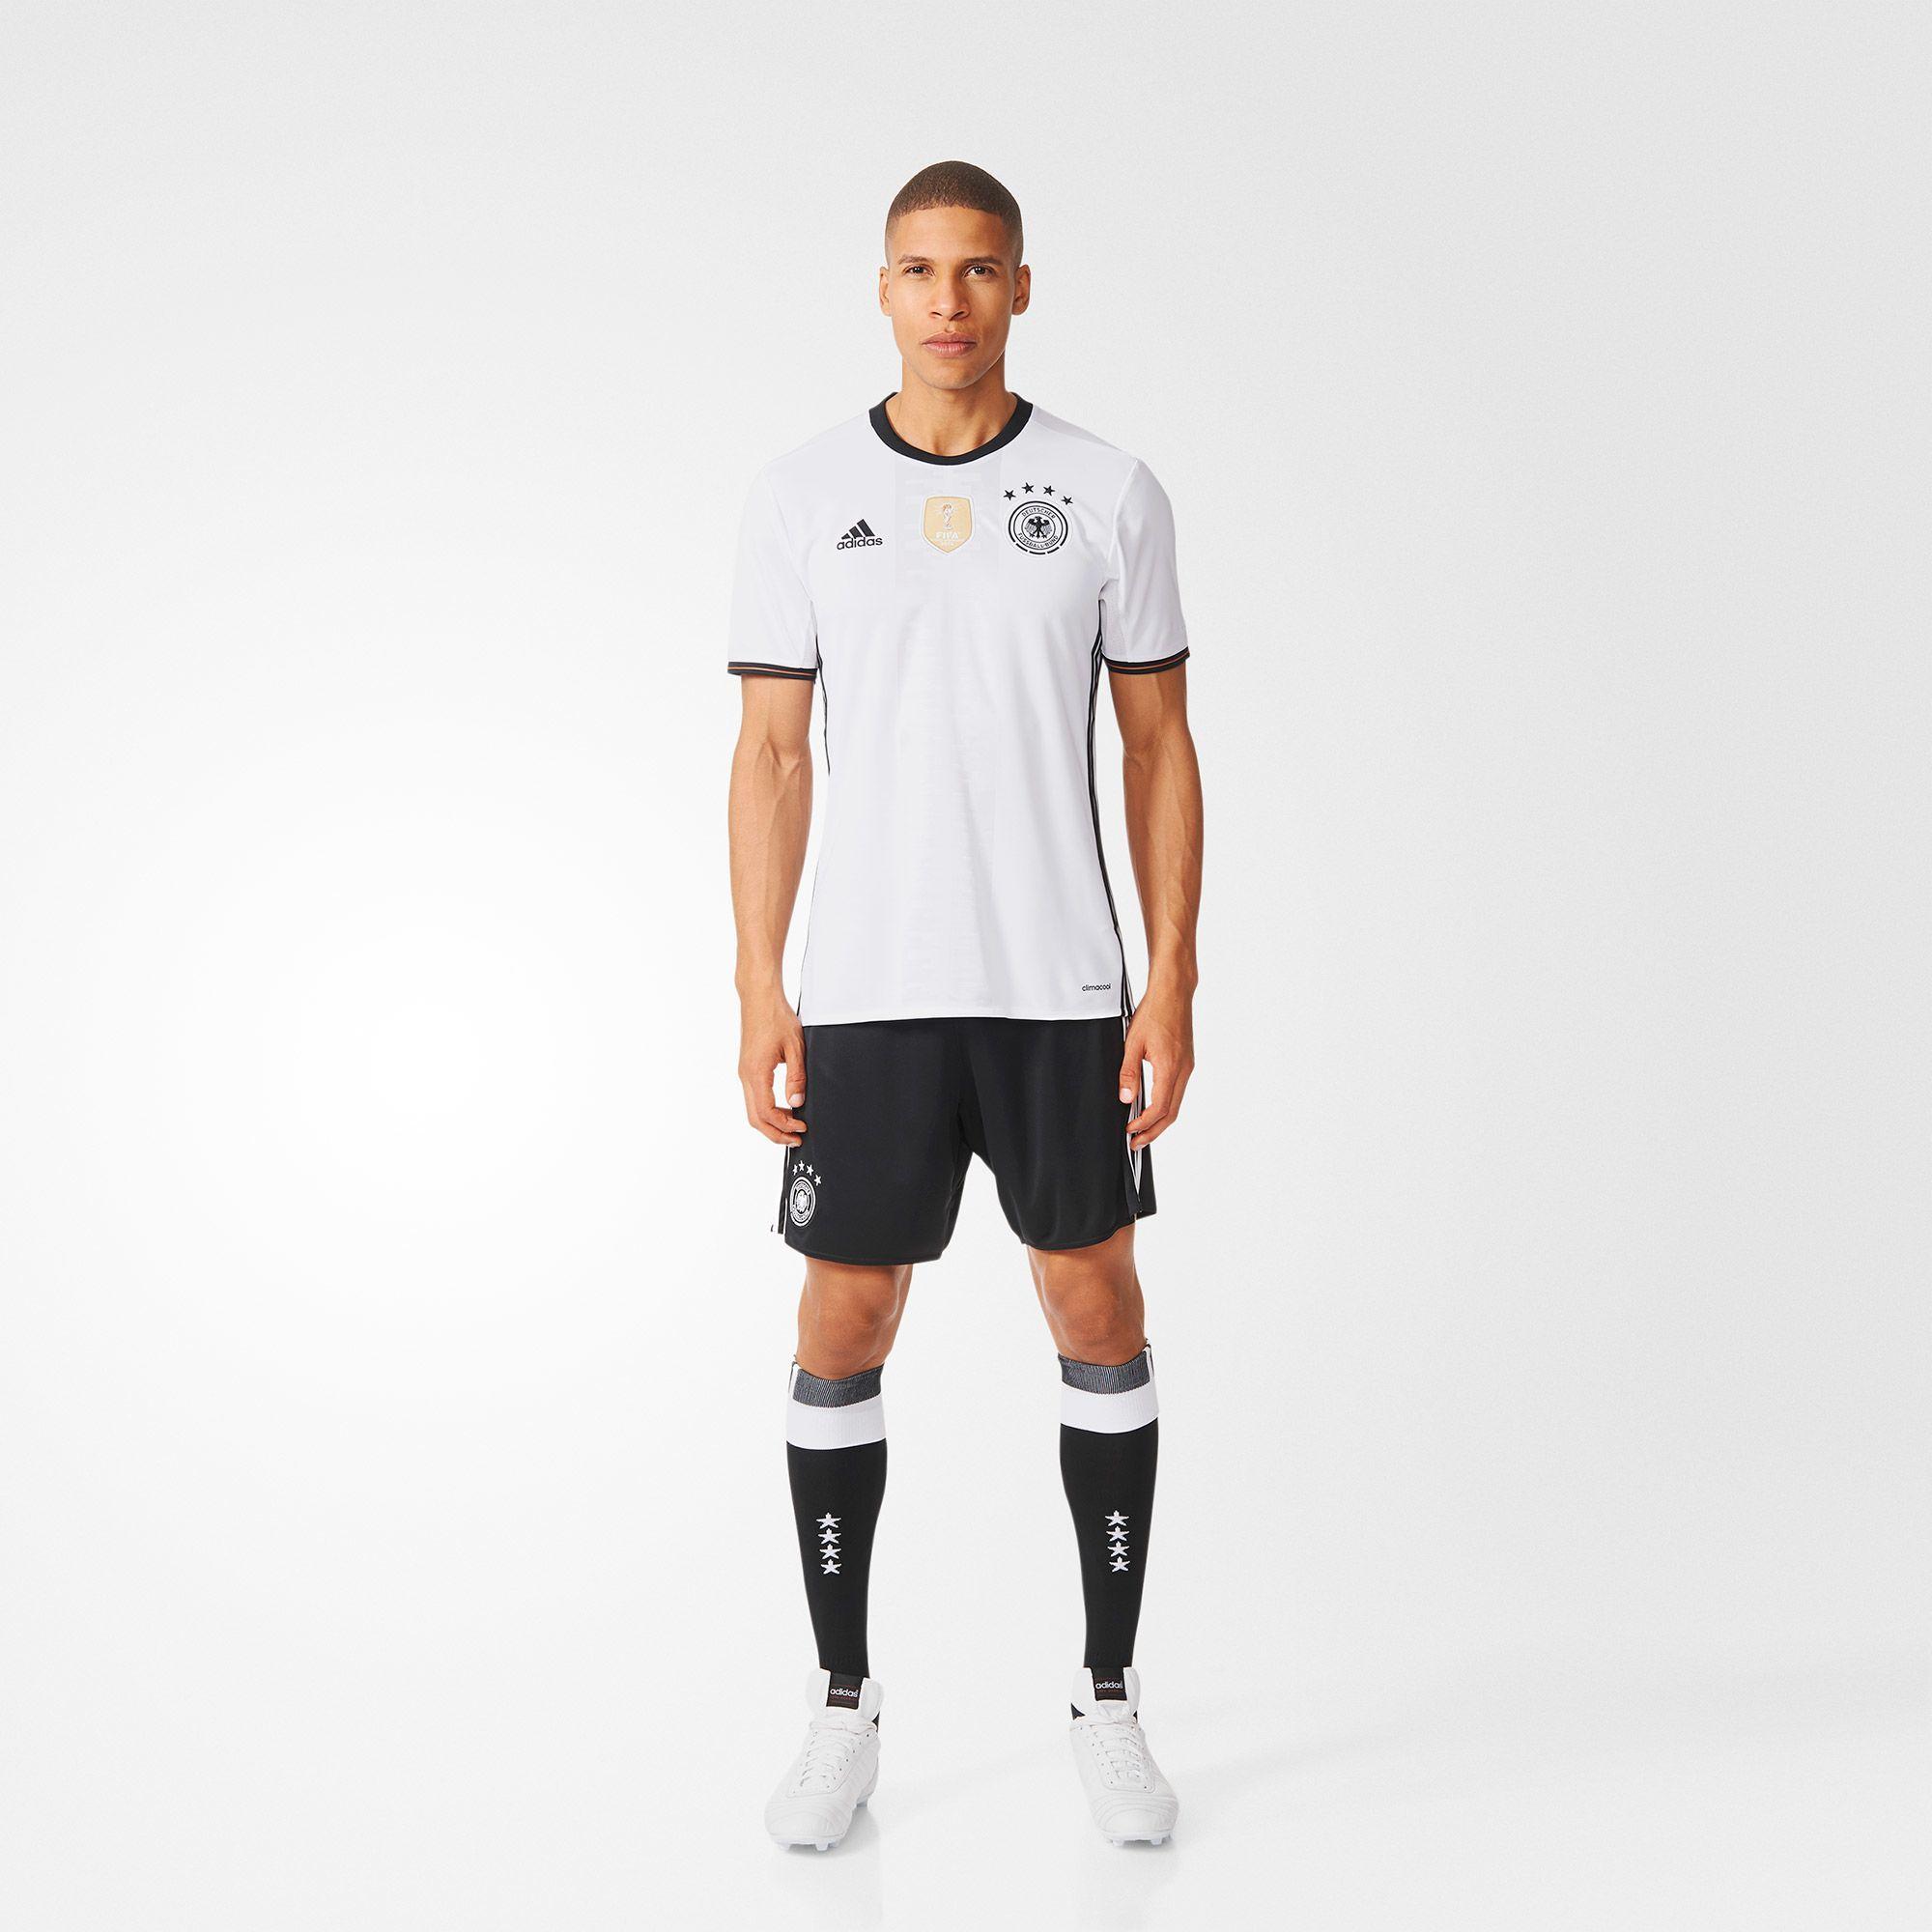 adidas UEFA EURO 2016 DFB Heimtrikot Replica - weiß | adidas Deutschland